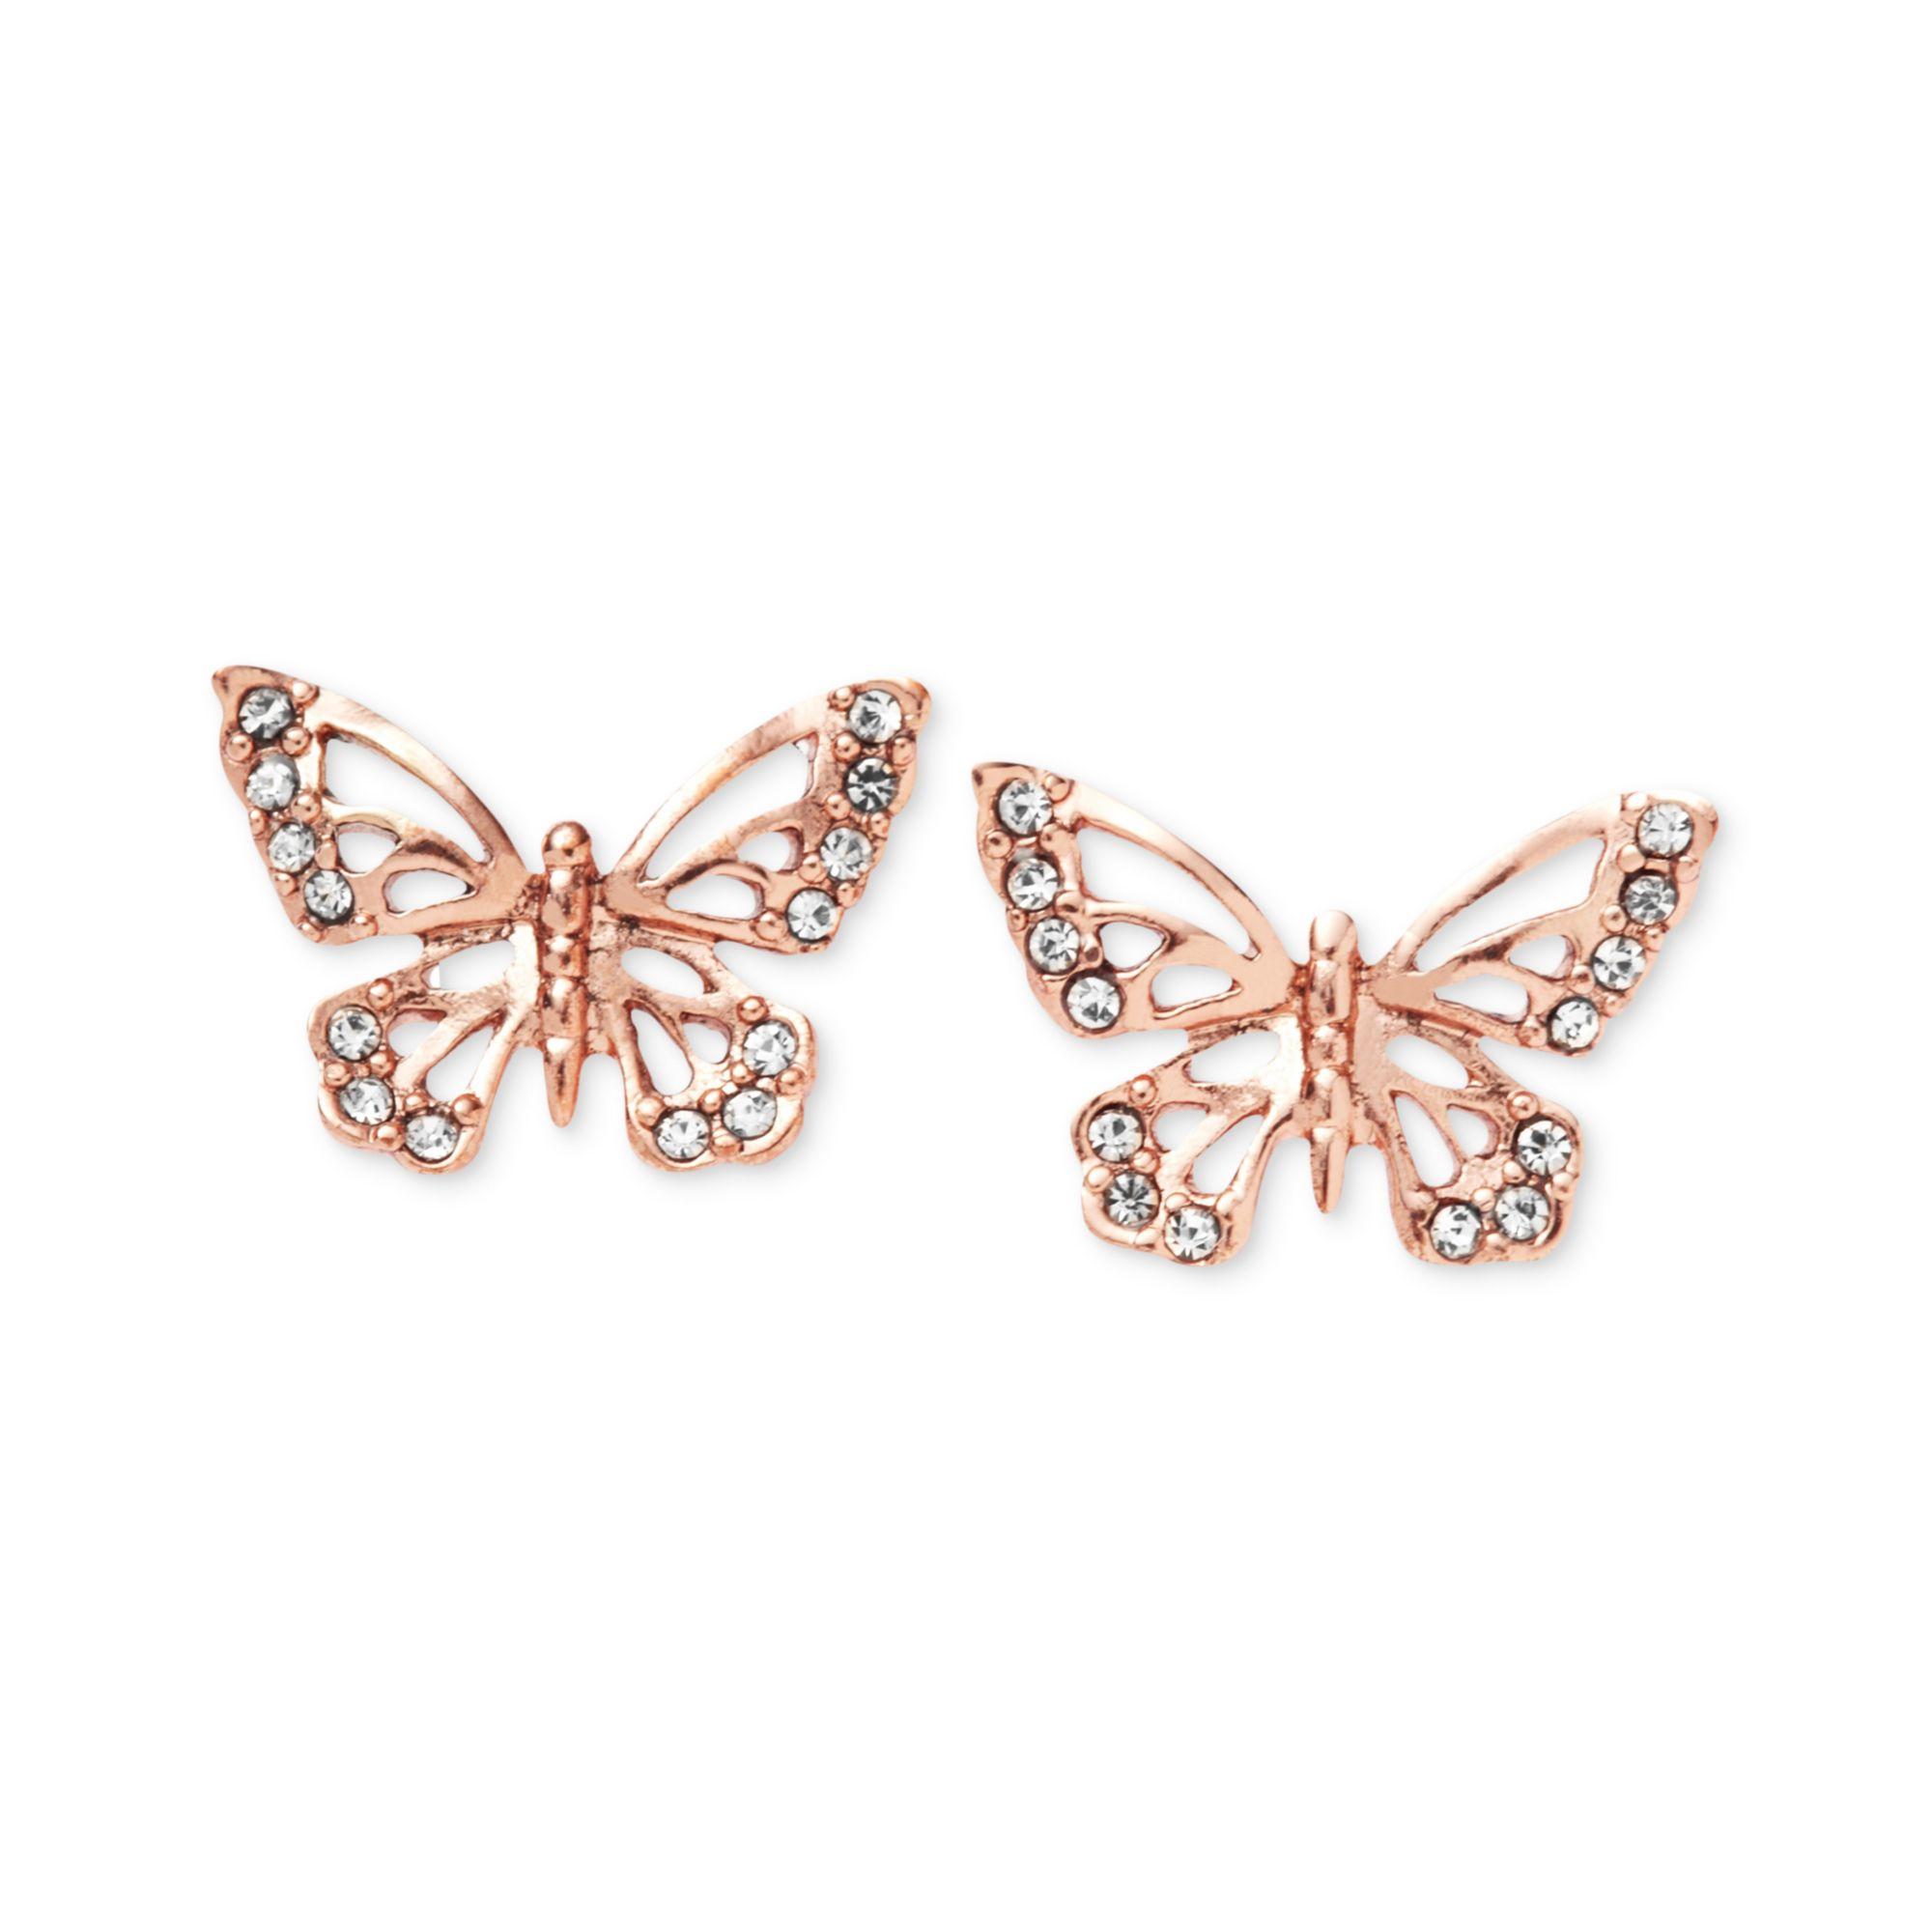 Fossil Rose Goldtone Crystal Butterfly Stud Earrings in ...